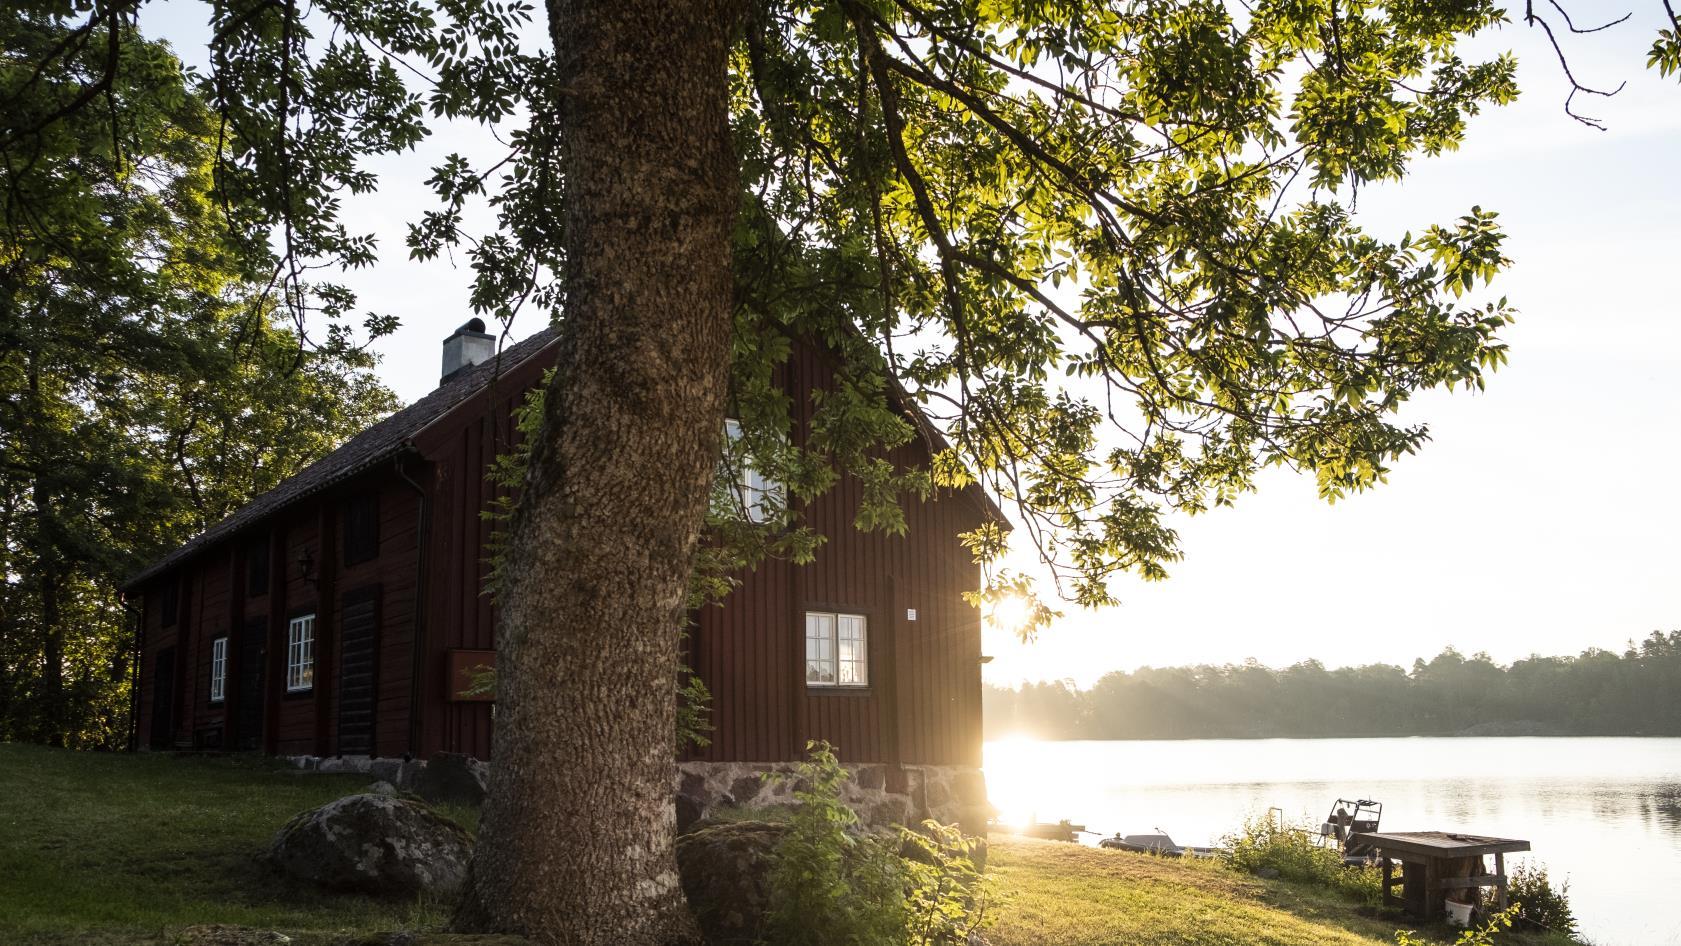 Sommarmorgon i Sverige i naturen.